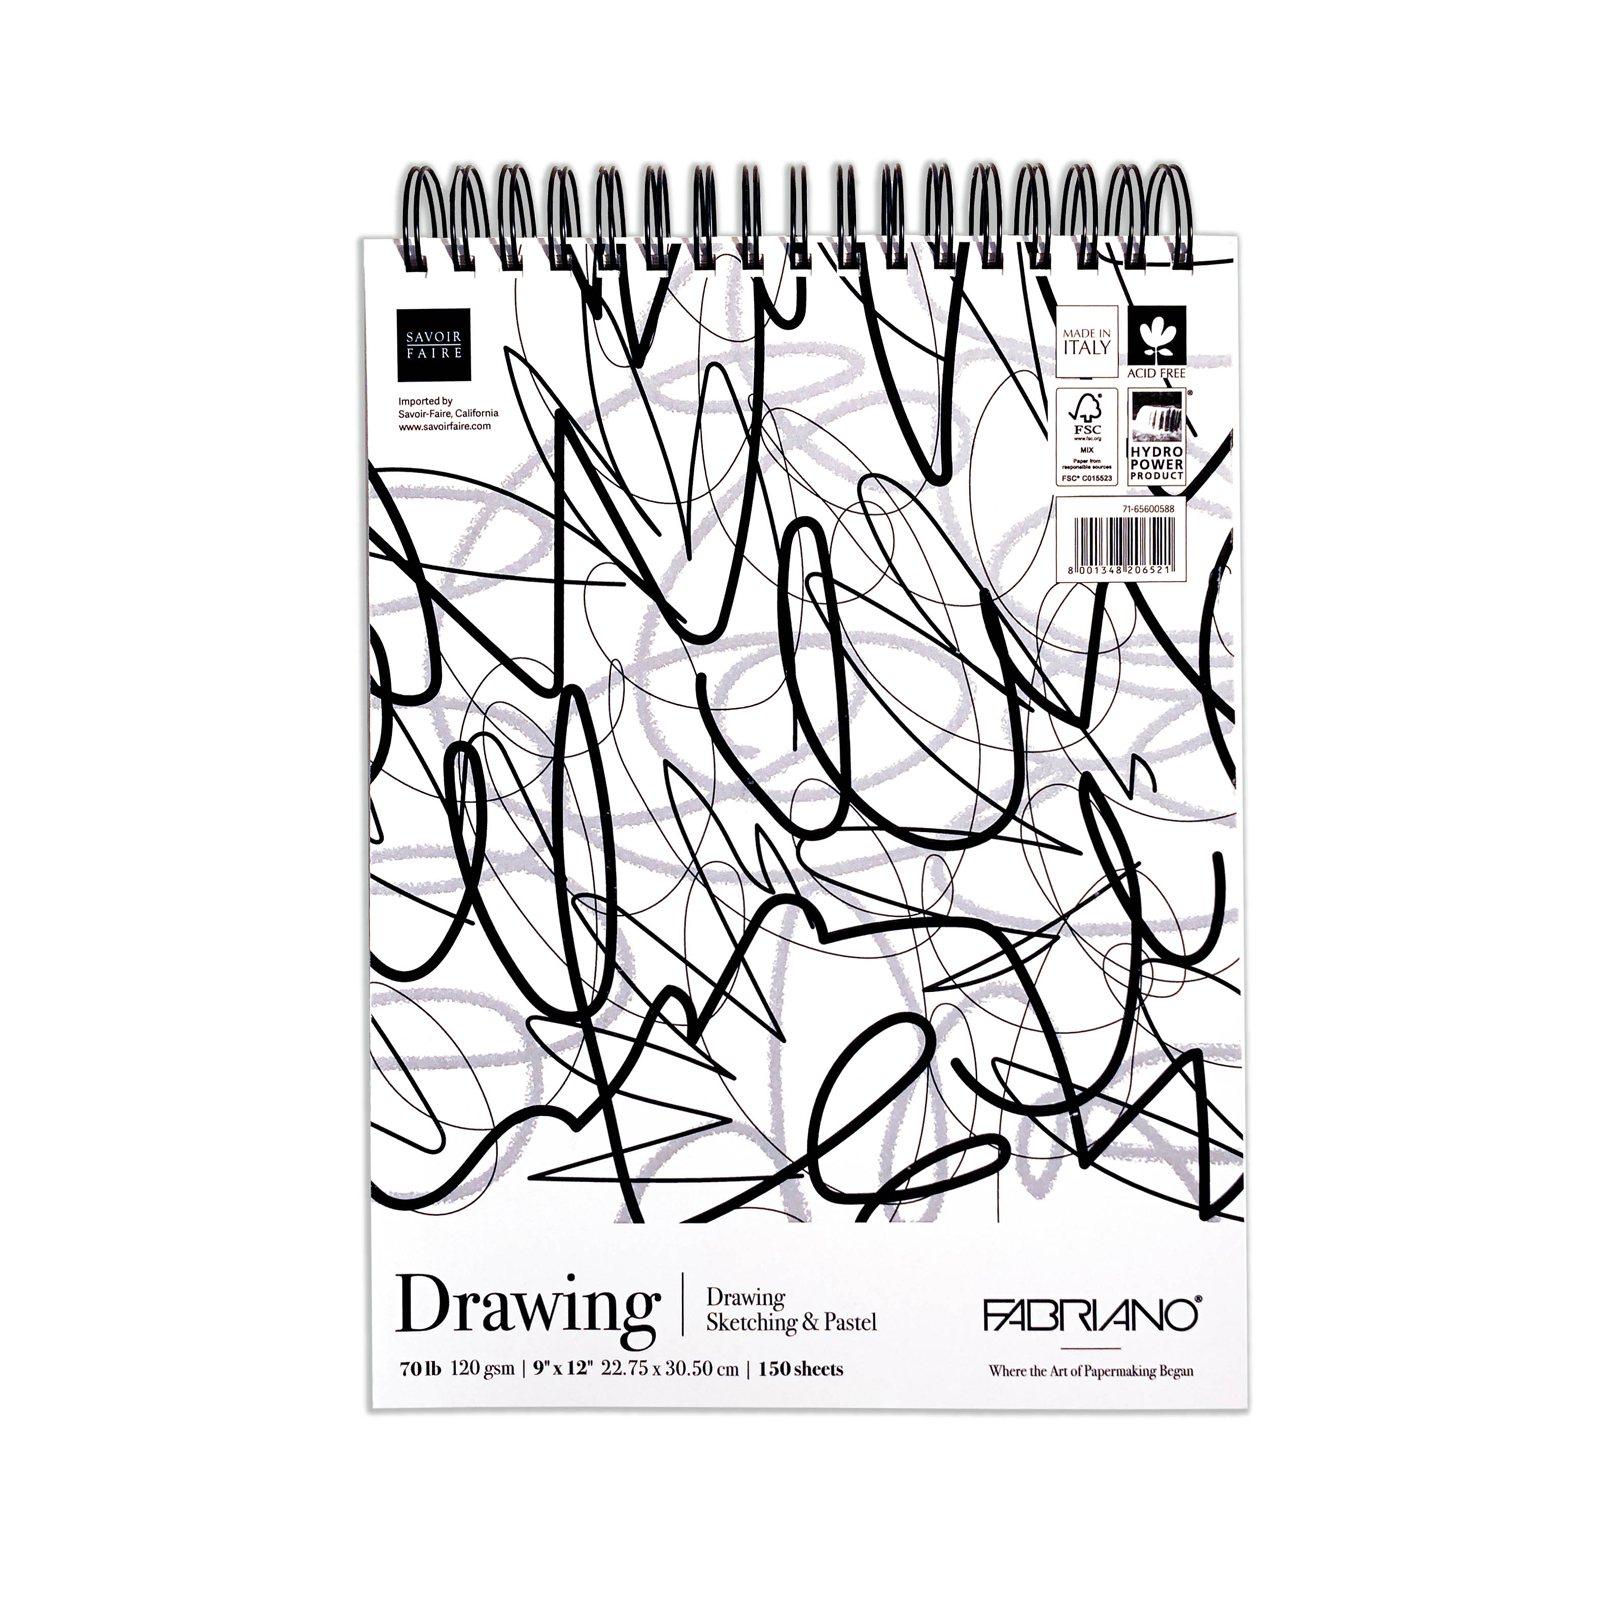 Fabriano Fat Pad Drawing 9 X12 70lbs 150 Sheets